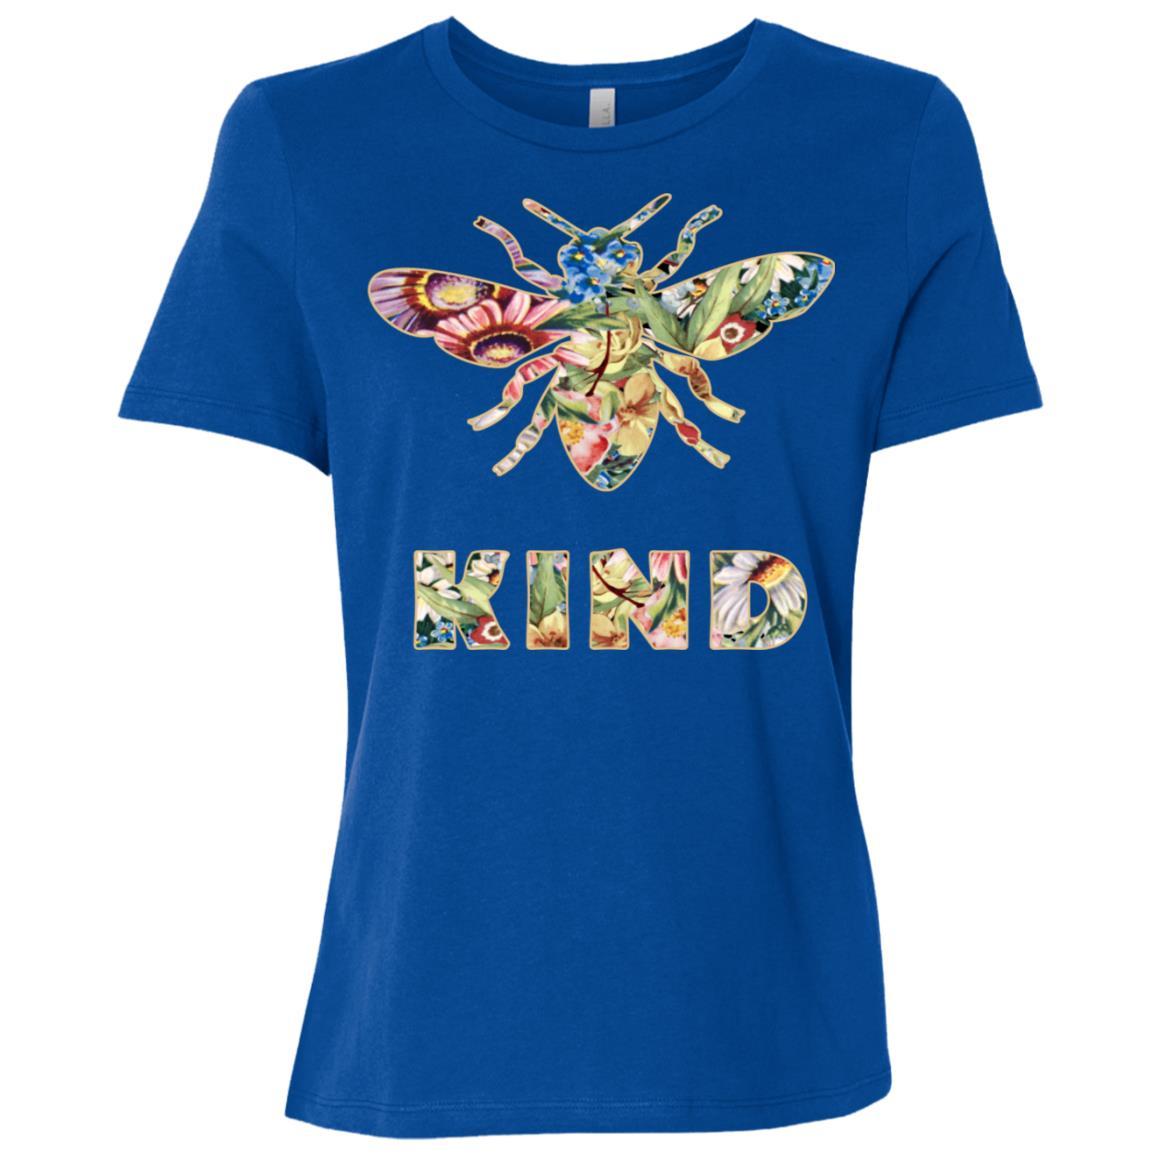 Bee kind Cute Bumble Bee Kindness Long -2 Women Short Sleeve T-Shirt